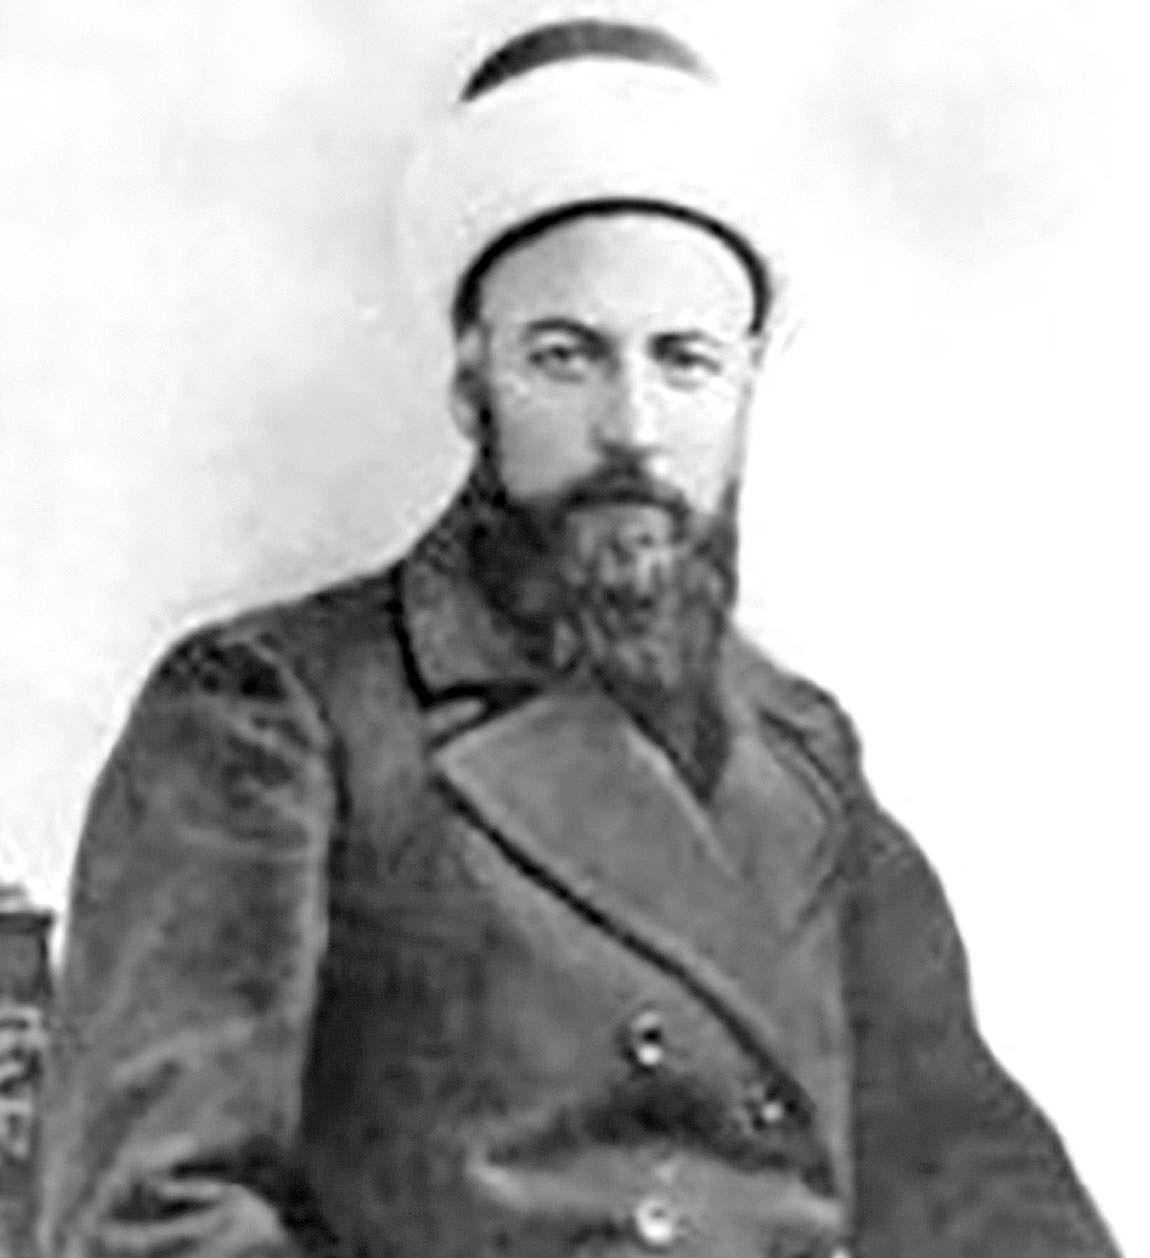 سر پرشور میرزا حسن تبریزی